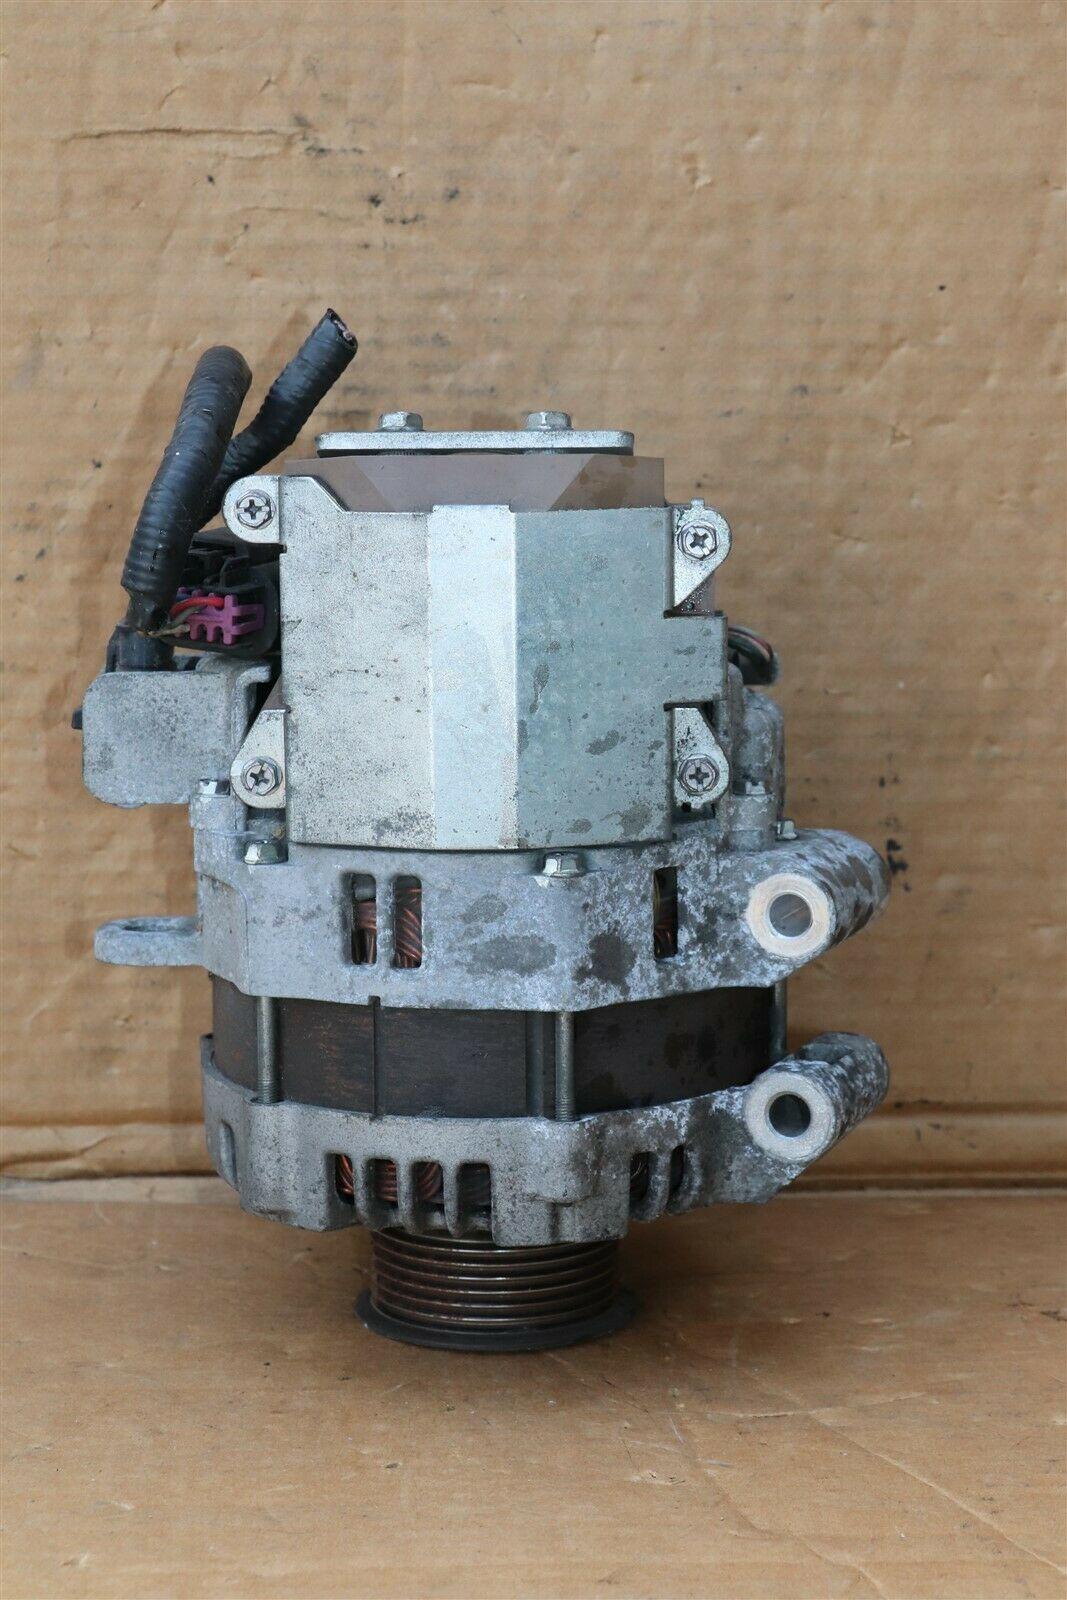 08-10 Malibu 07-09 Saturn Aura Vue Hybrid Alternator Generator  24239872